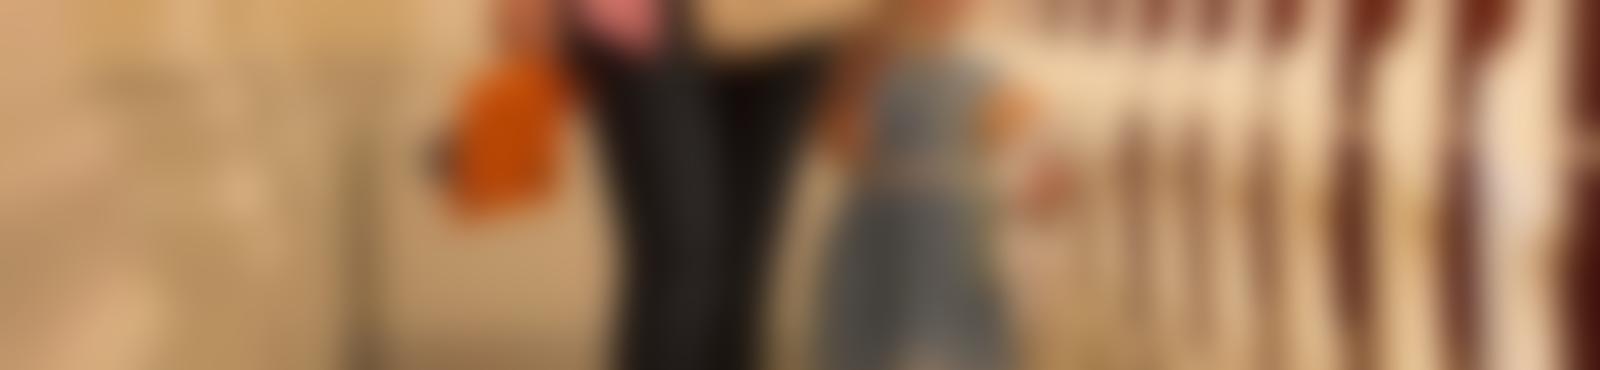 Blurred 5d510233 307e 4cd1 8c8f 809a2efdeecb